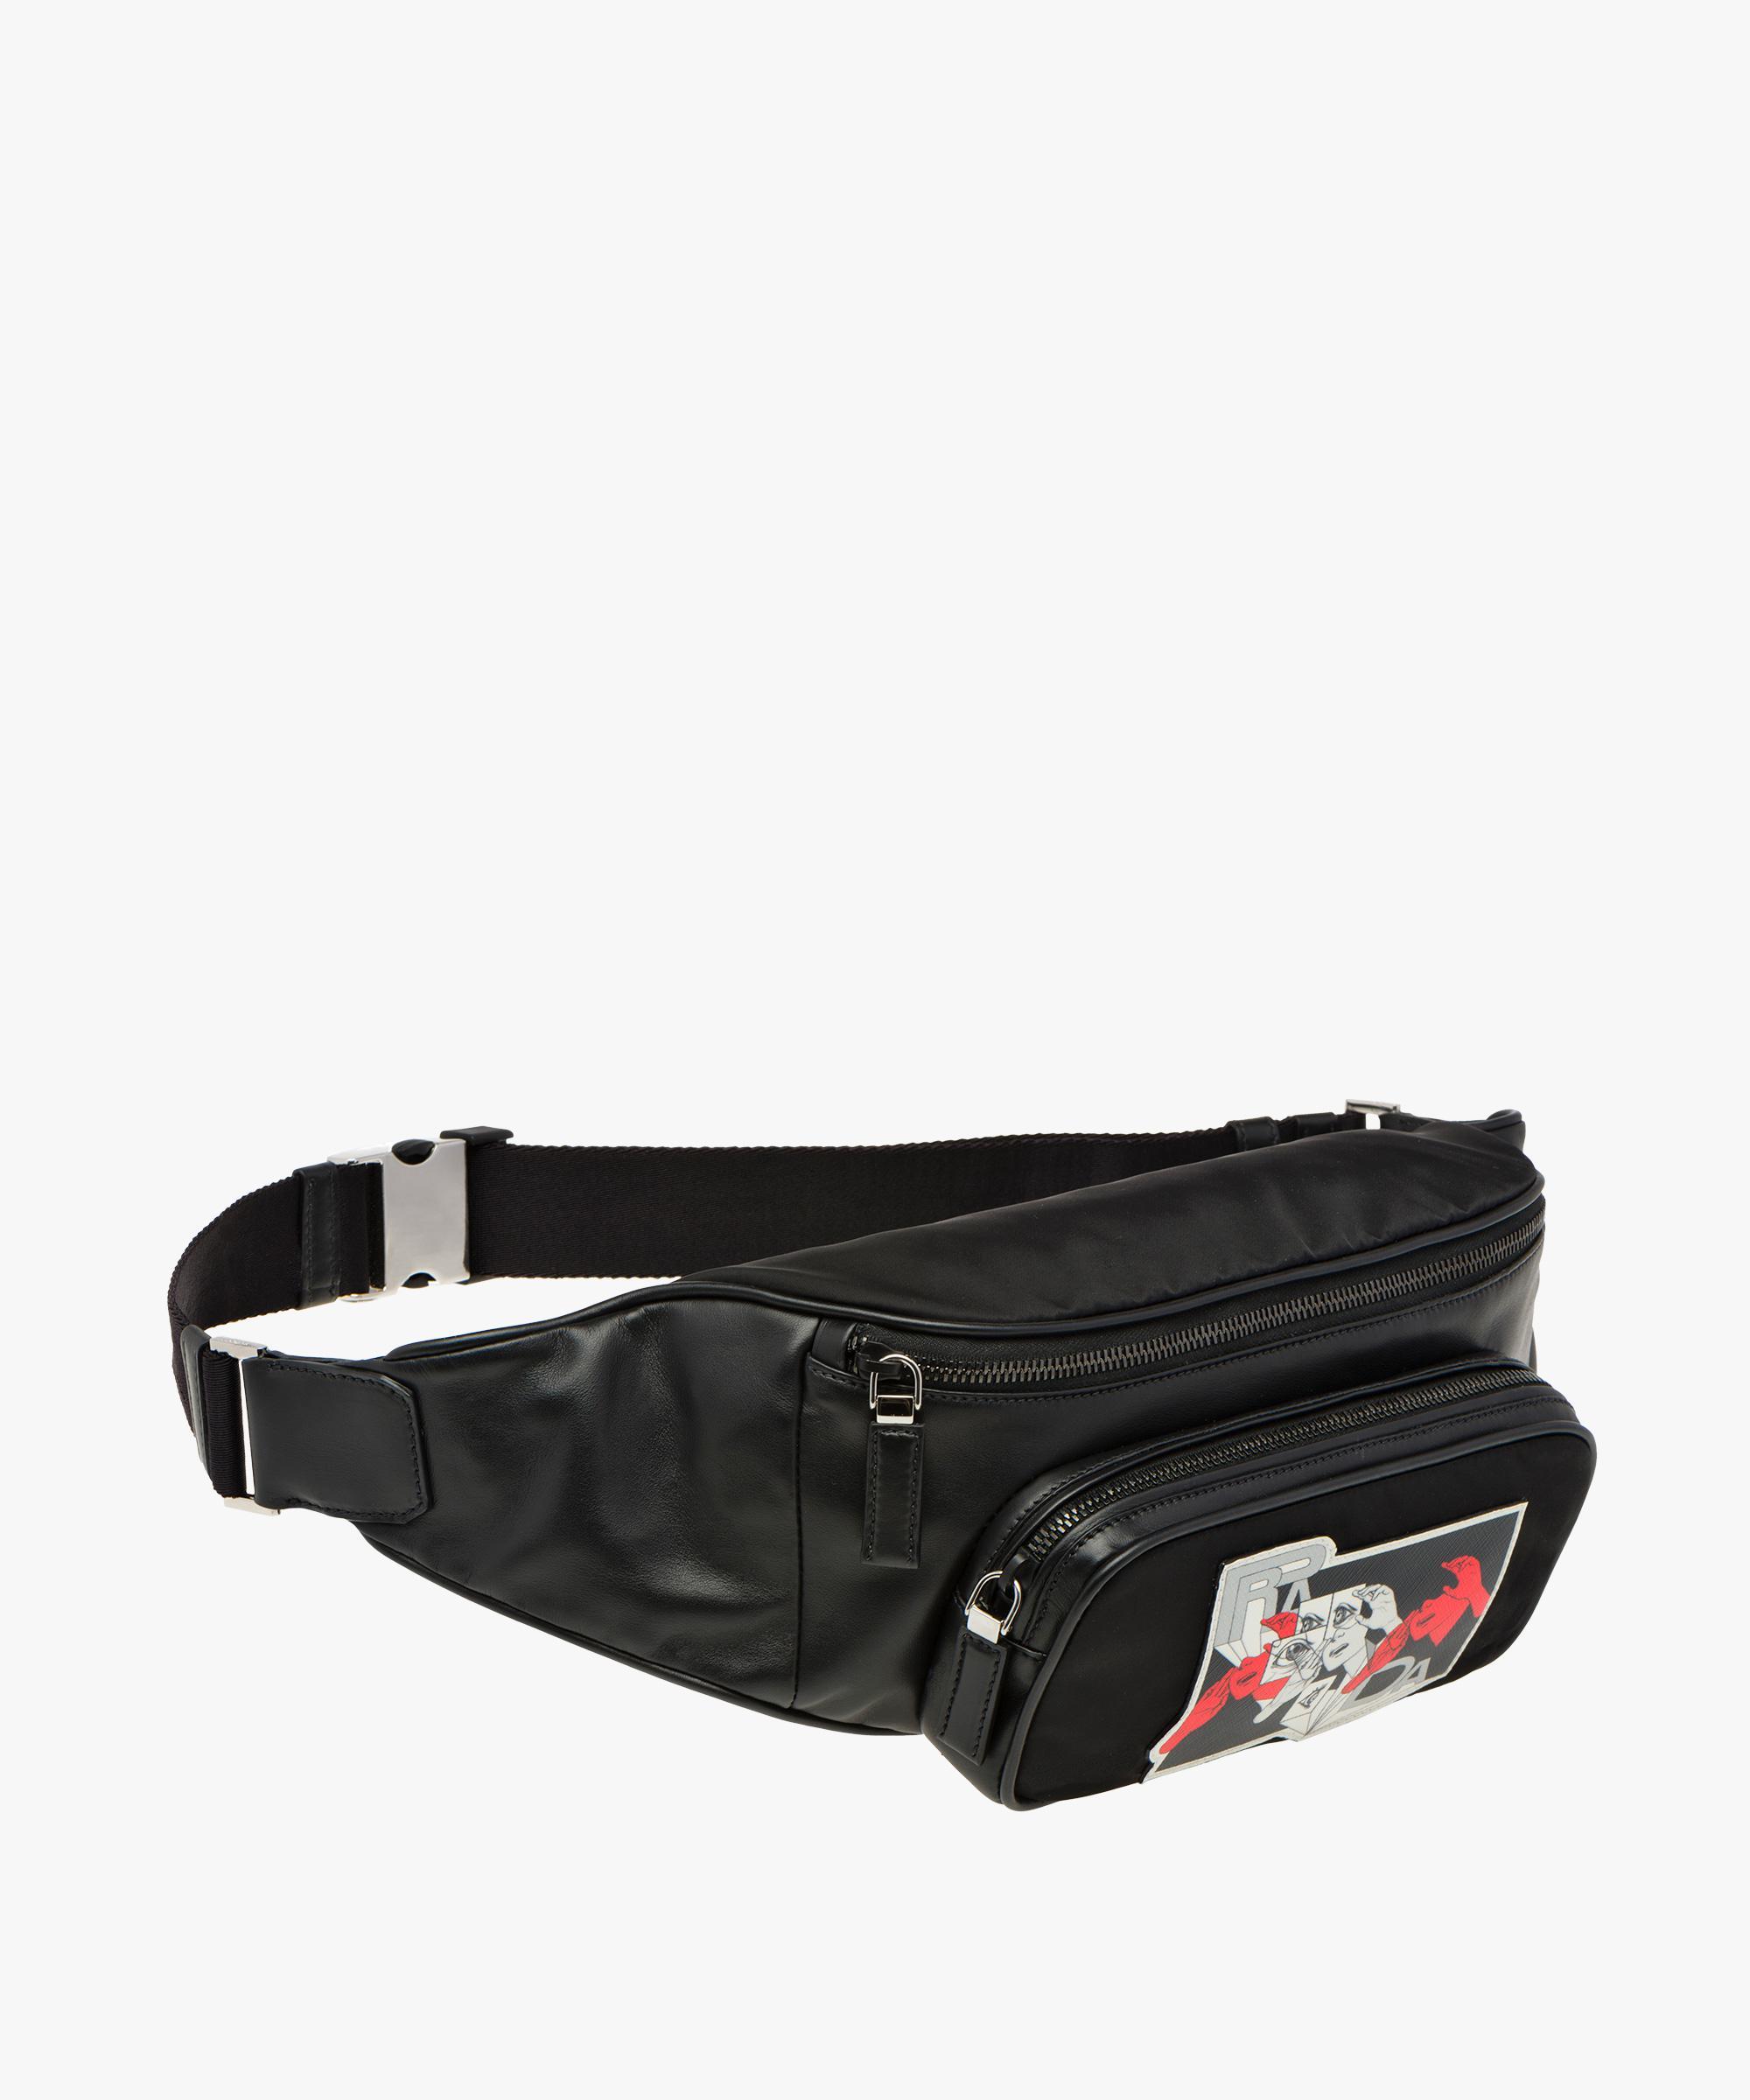 aae160625fb7 Prada Technical Fabric Belt Bag in Black for Men - Lyst